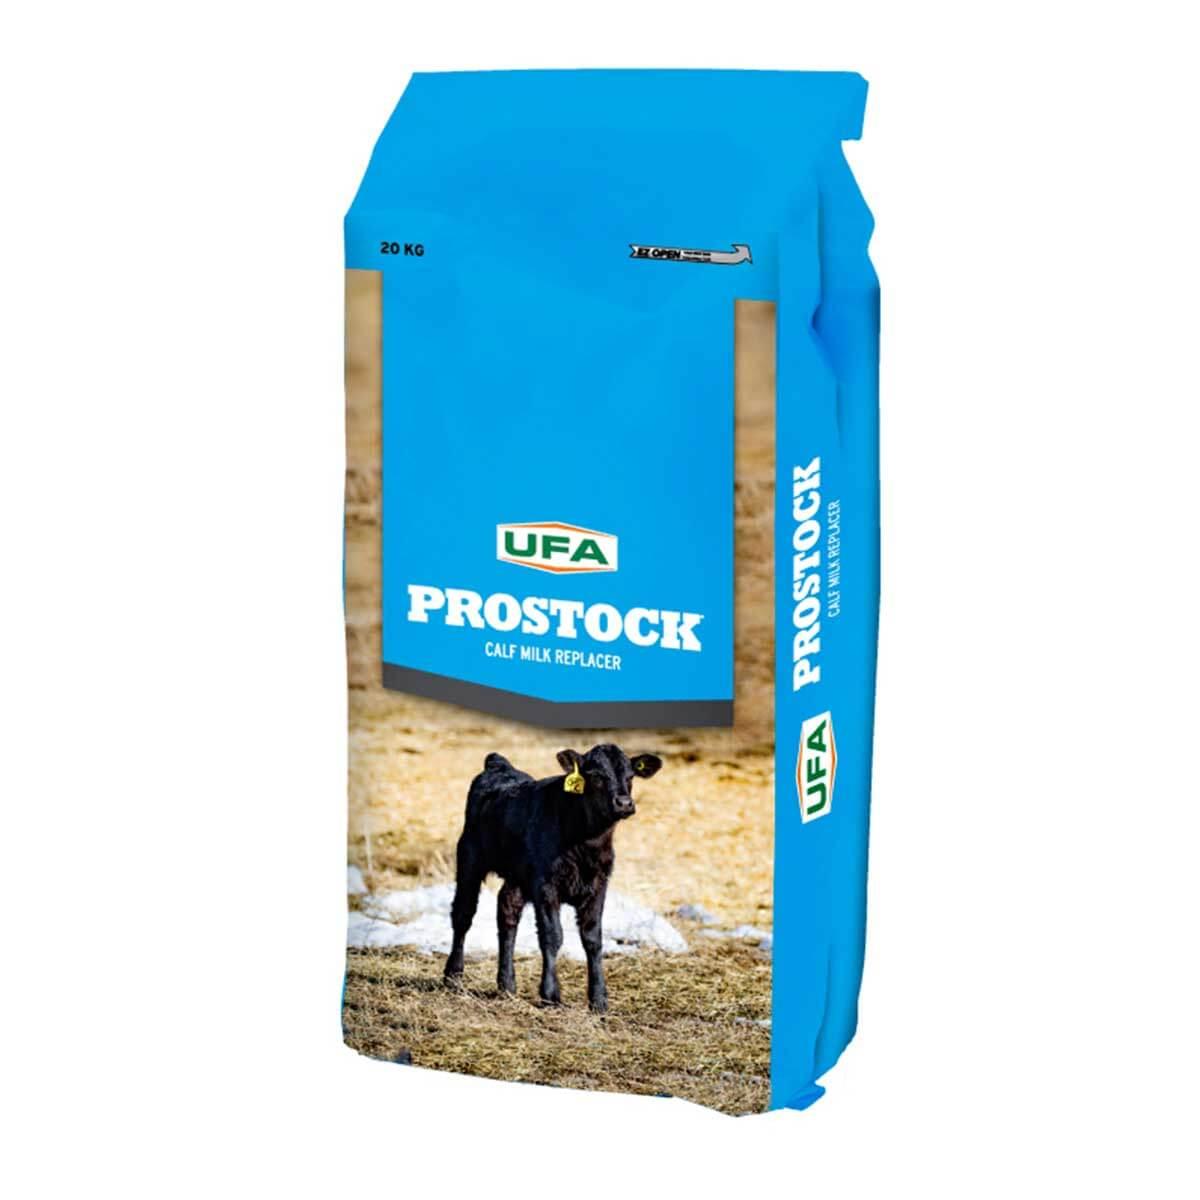 ProStock™ CALF MILK REPLACER - 20 KG